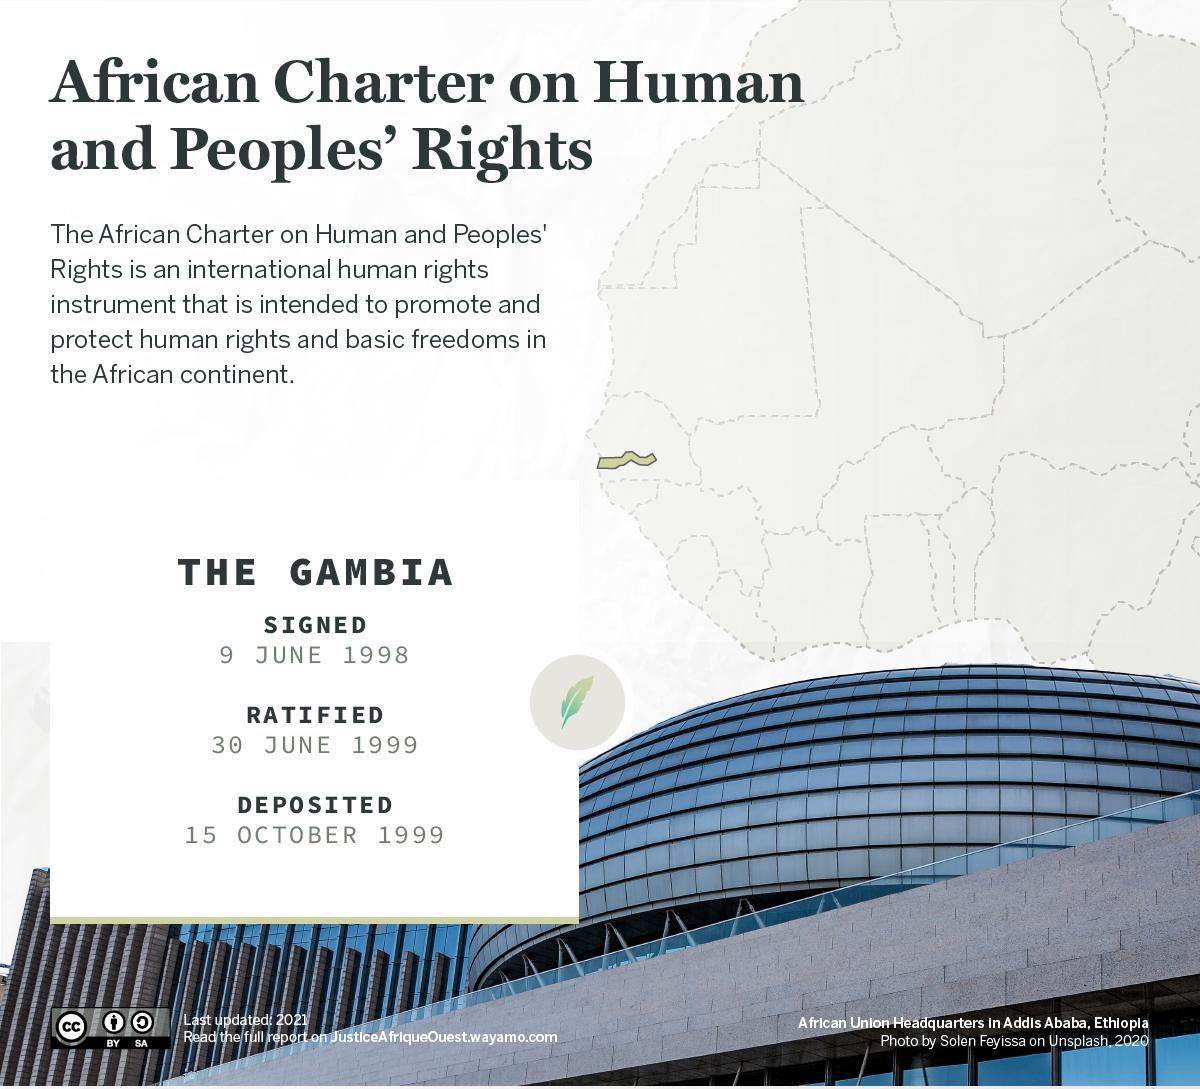 __GAMBIA_African Charter - Wayamo Foundation (CC BY-SA 4.0)